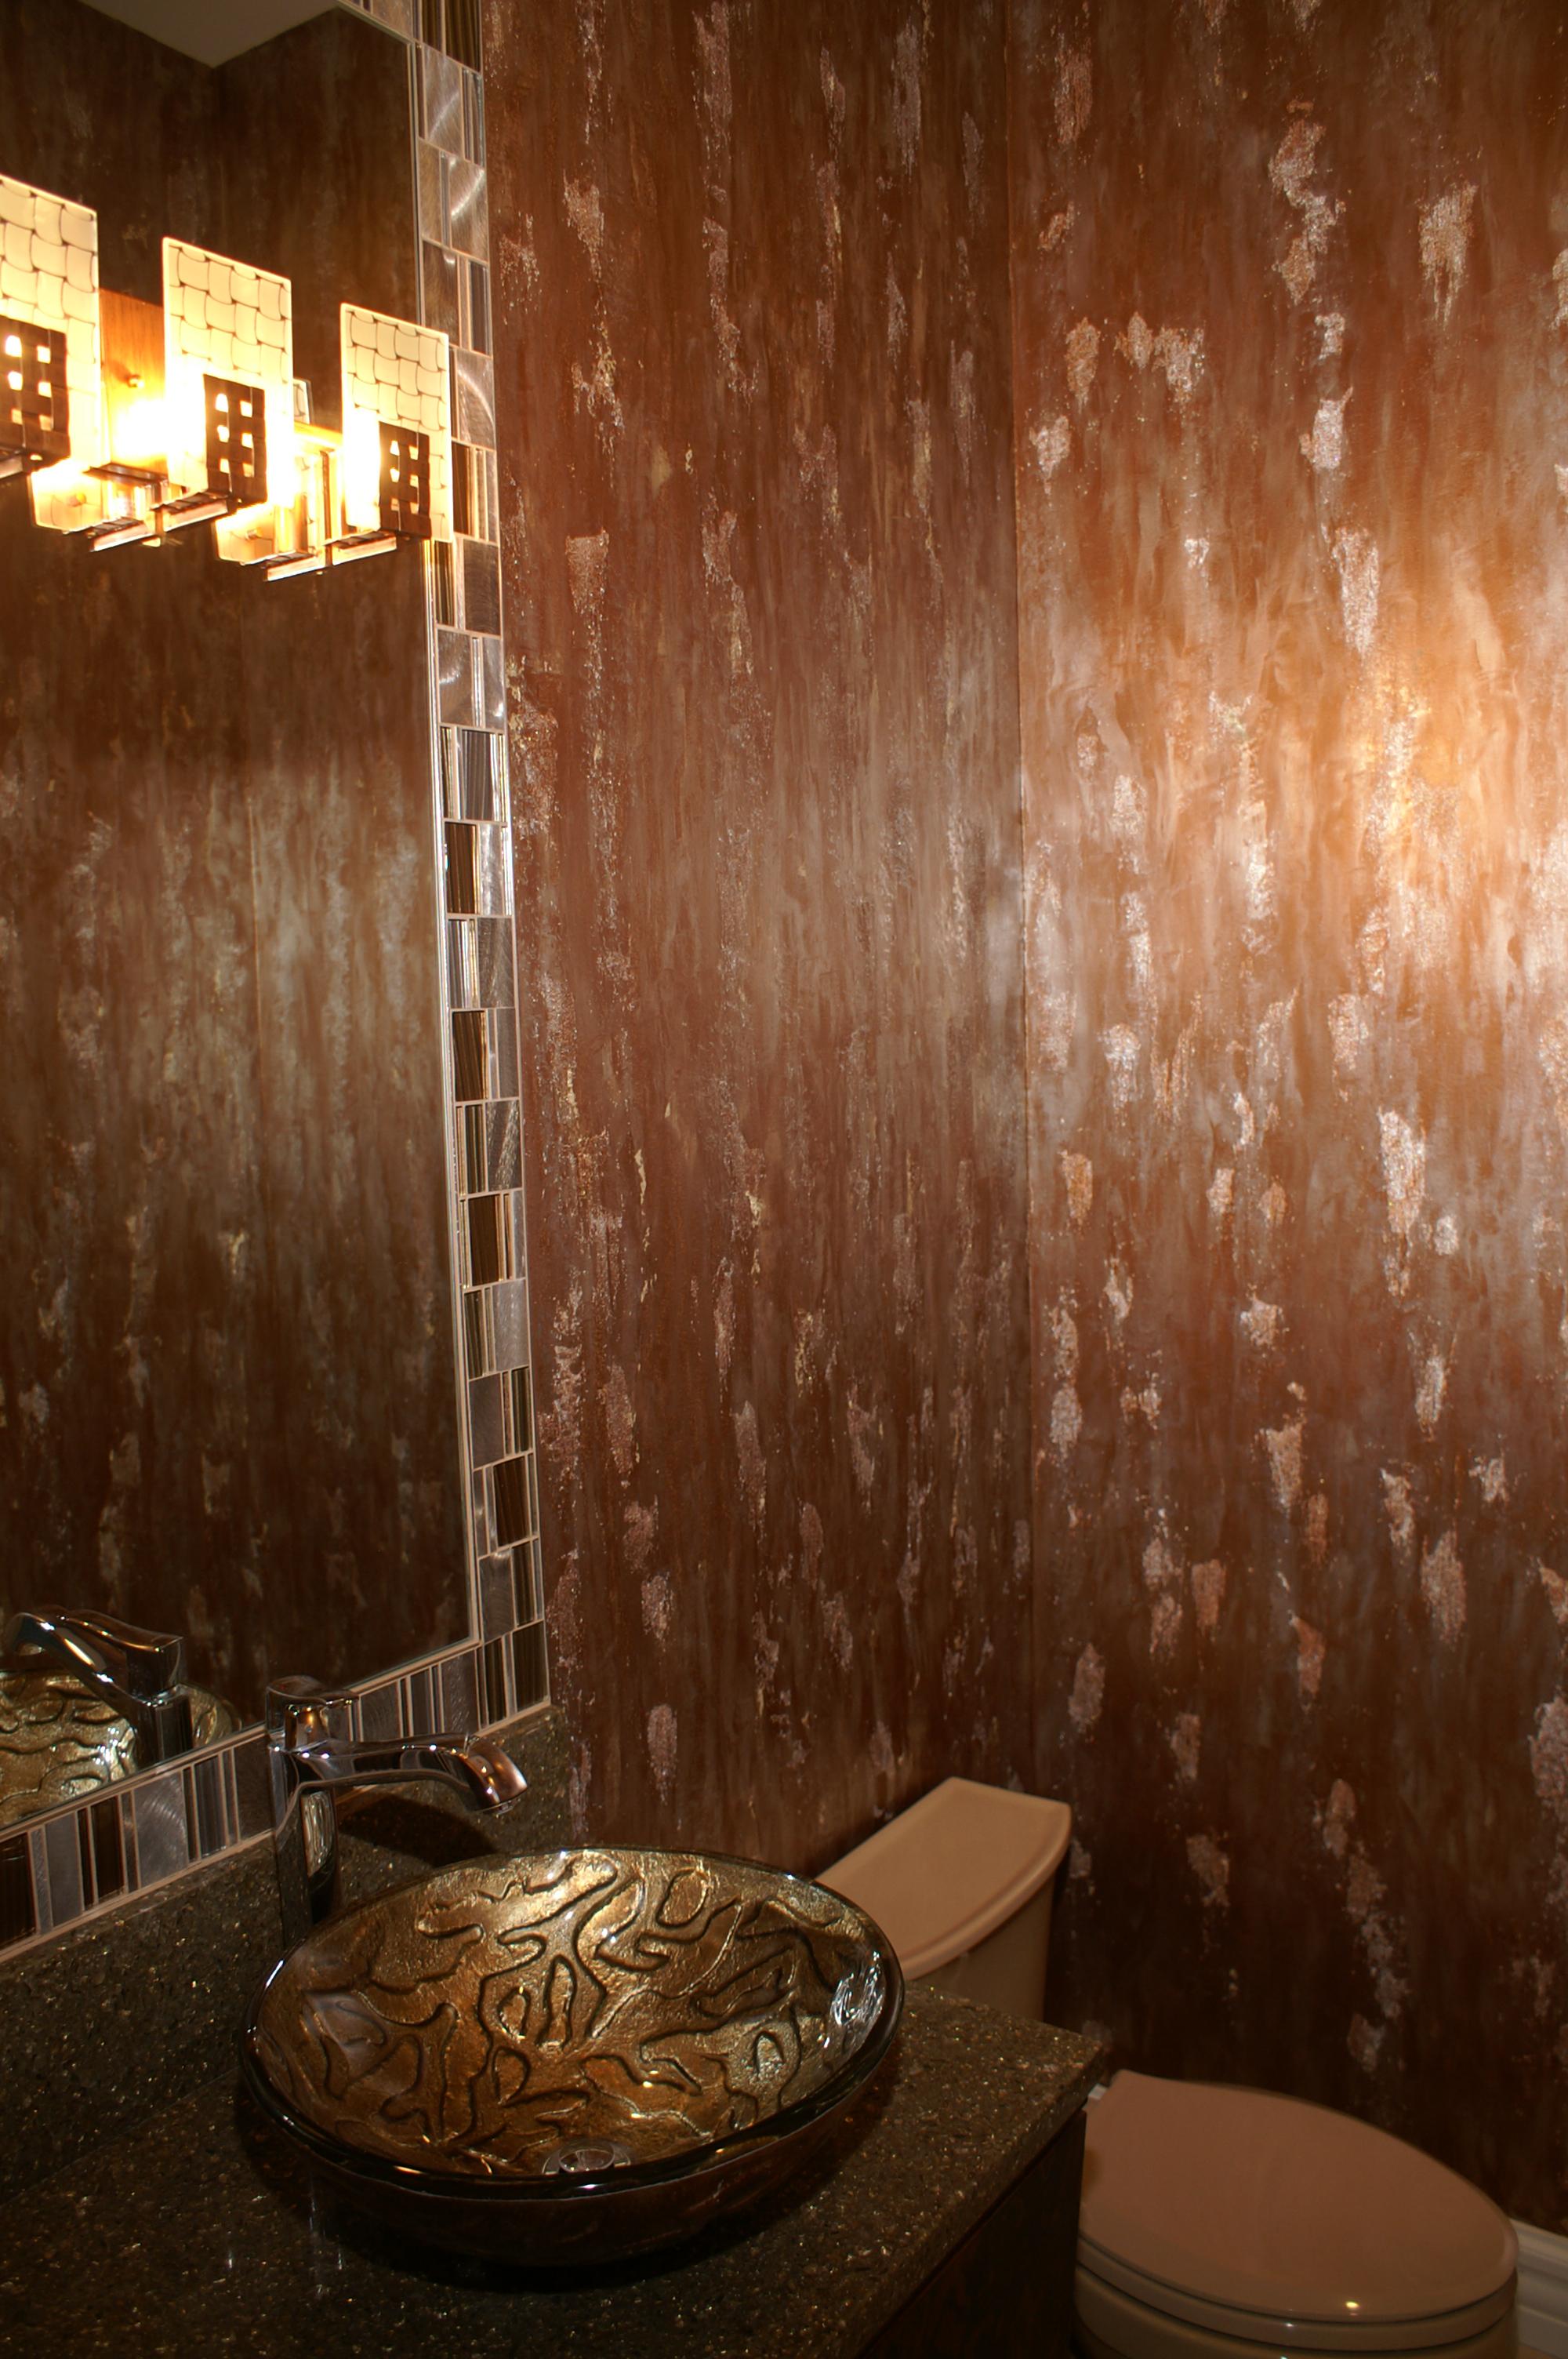 Contemporary Bathroom Design, Contemporary Artistic Wall Finish